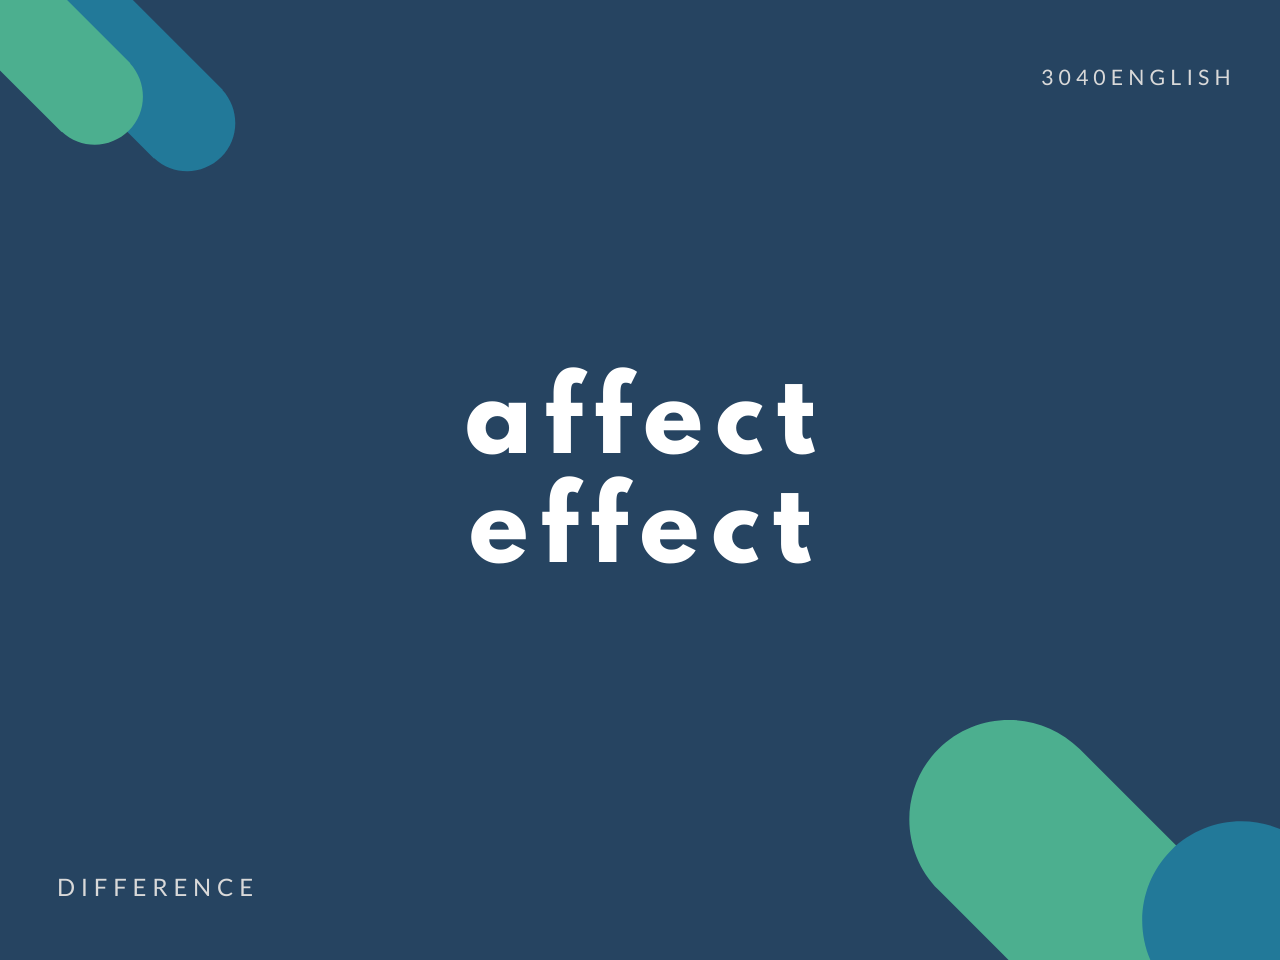 affect と effect の違いと簡単な使い方【解説・例文あり】